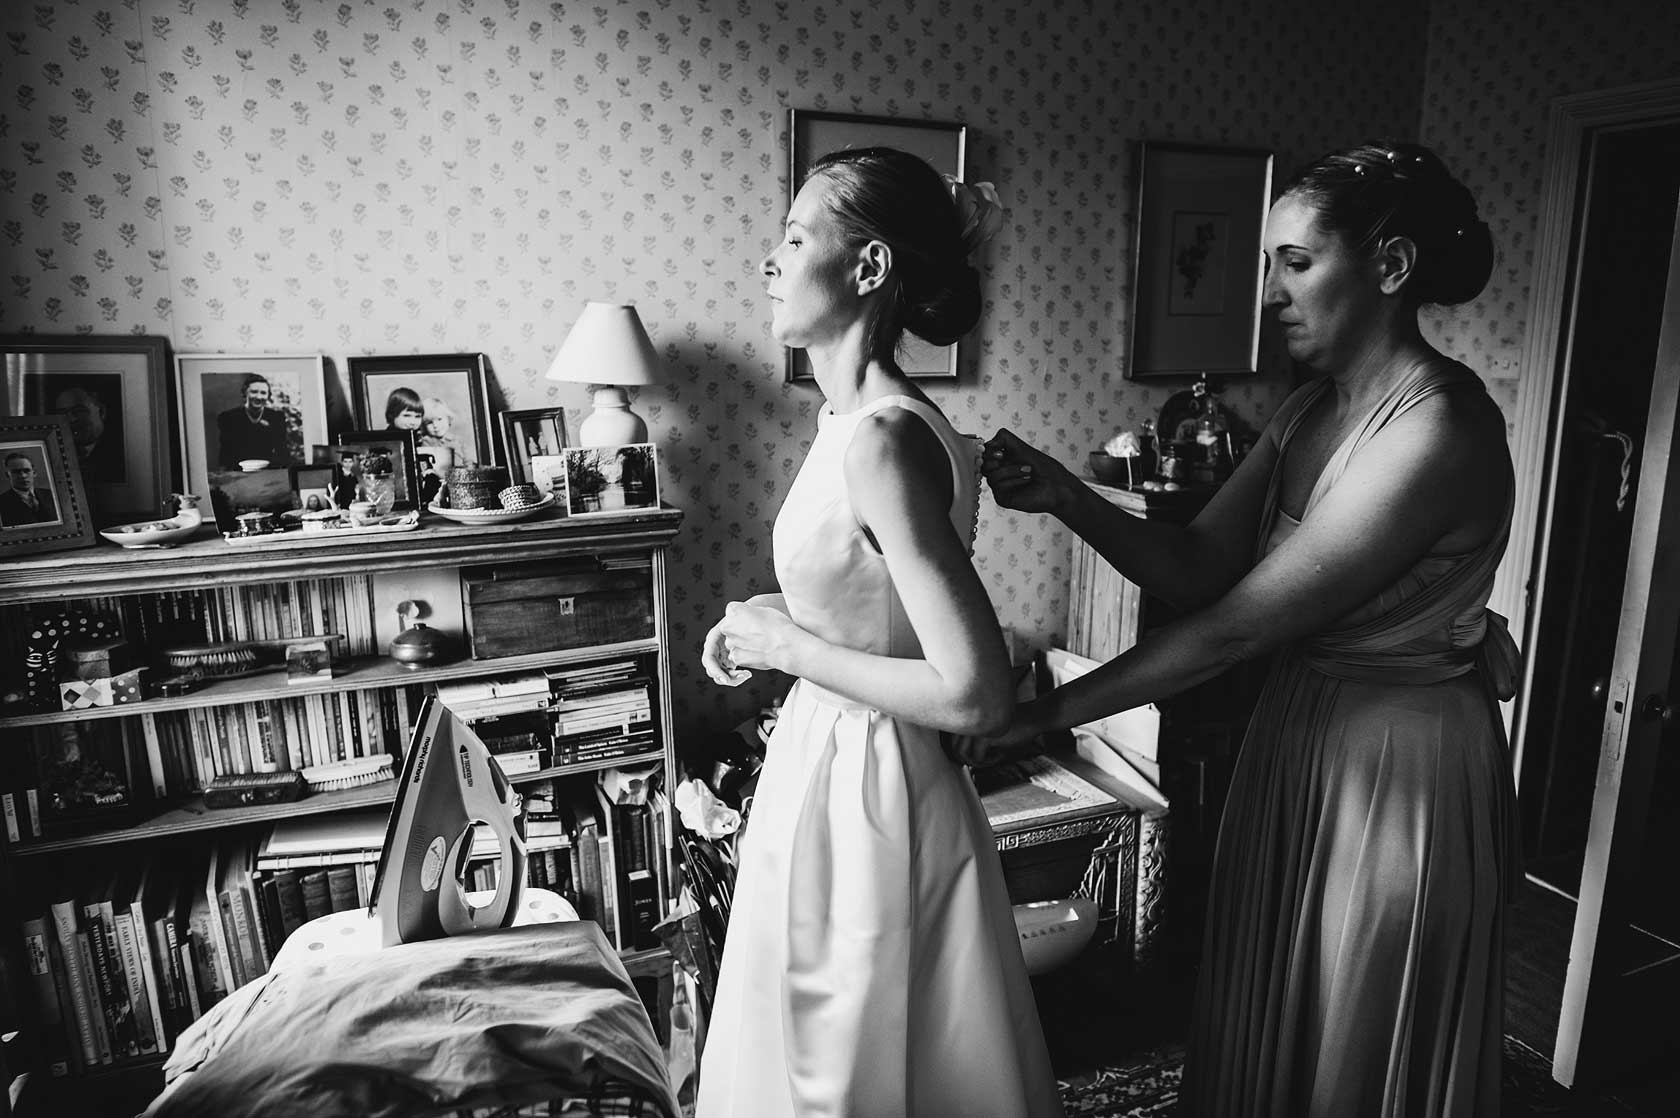 Reportage Wedding Photography at St Barts Hospital